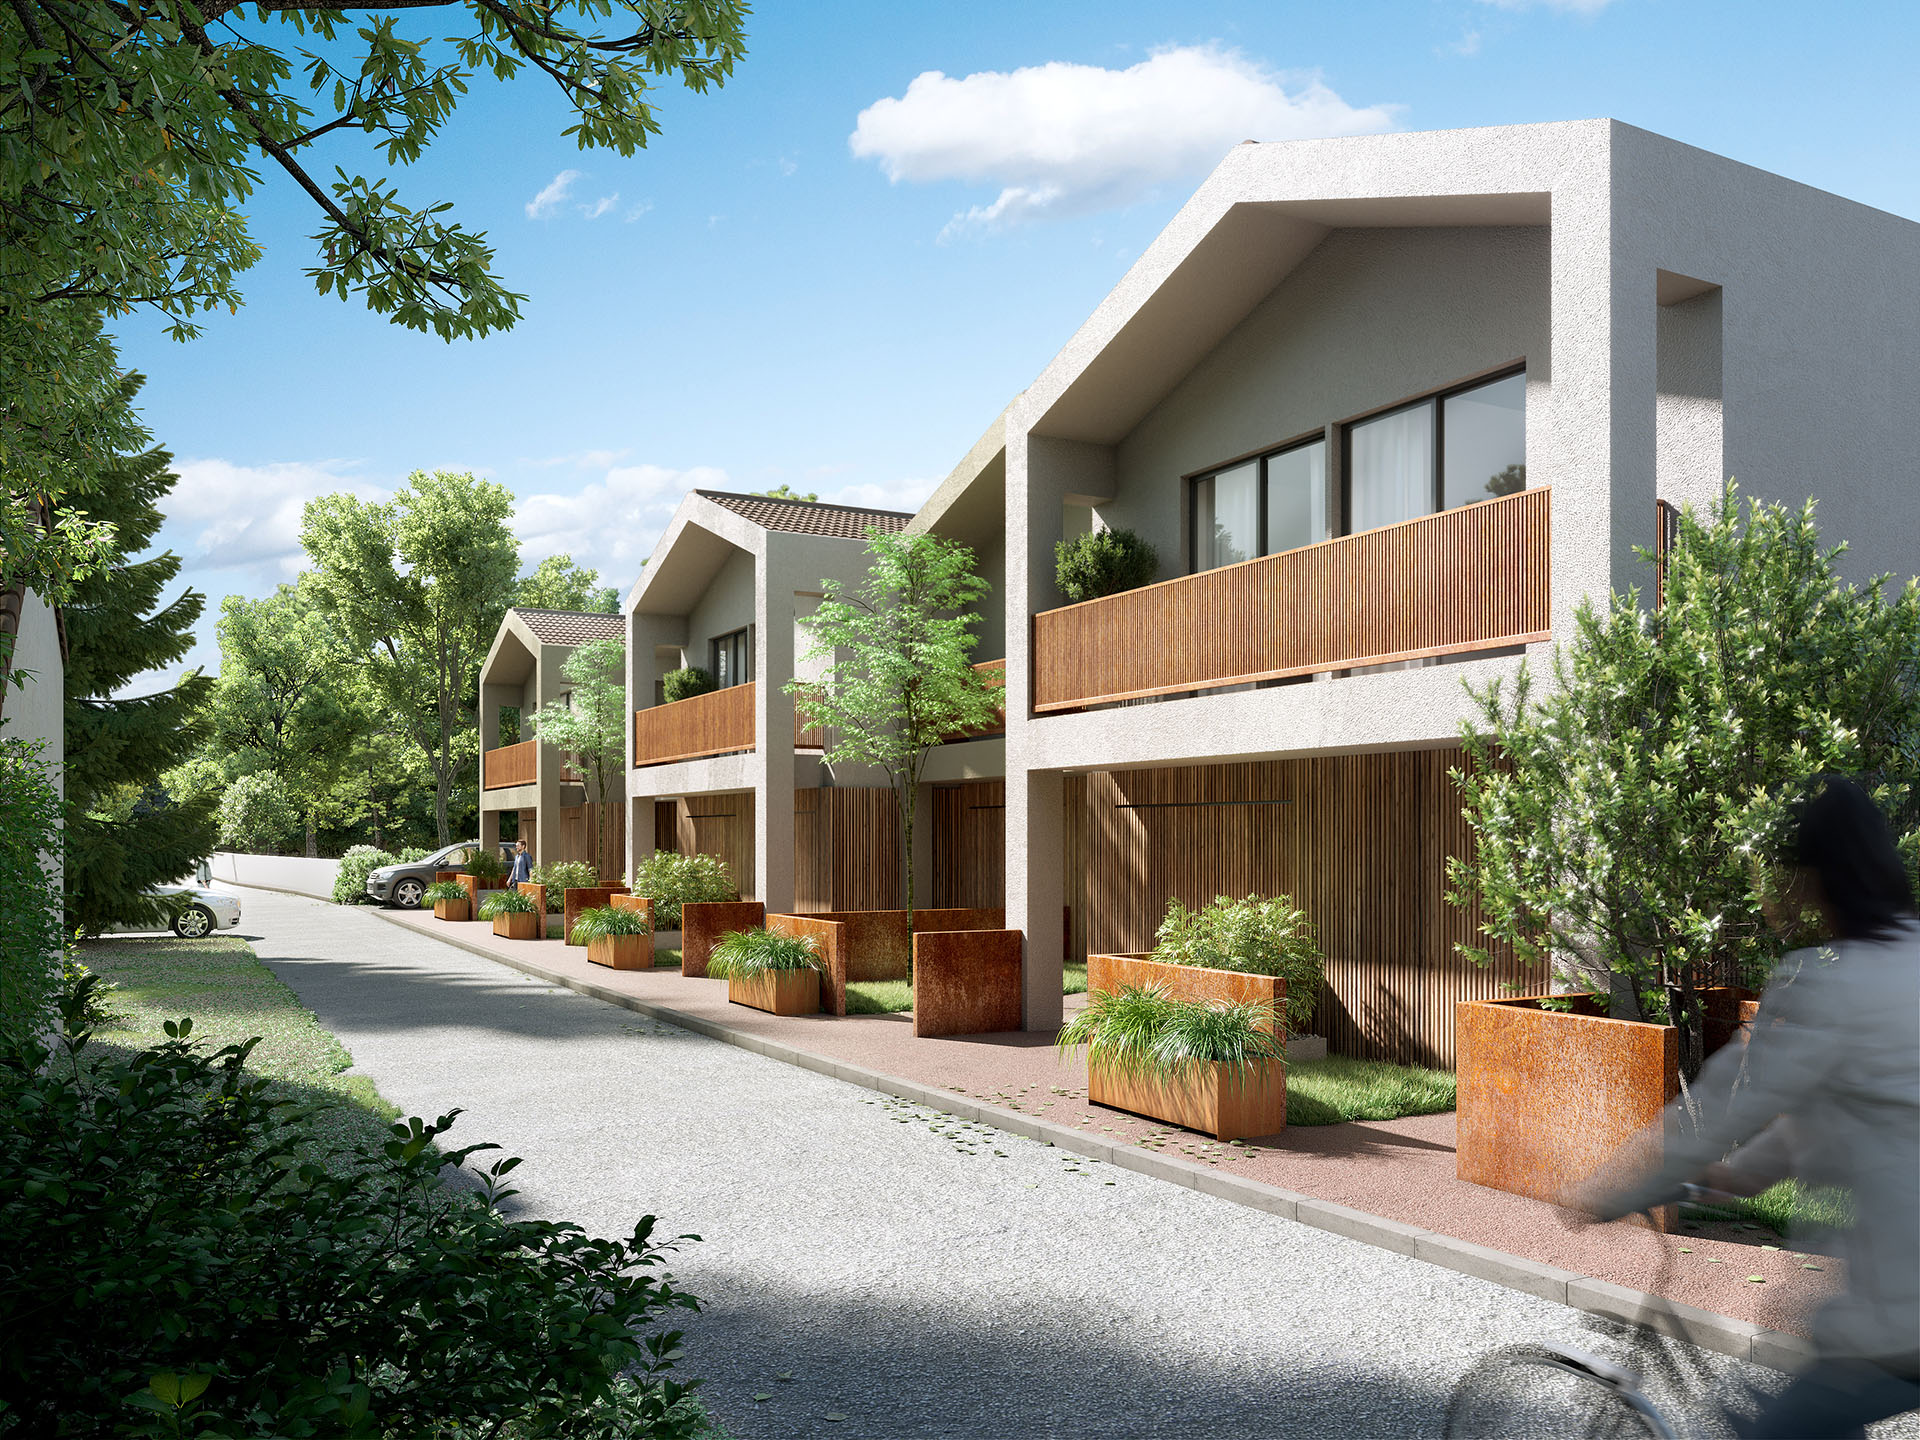 3D representation of modern terraced houses